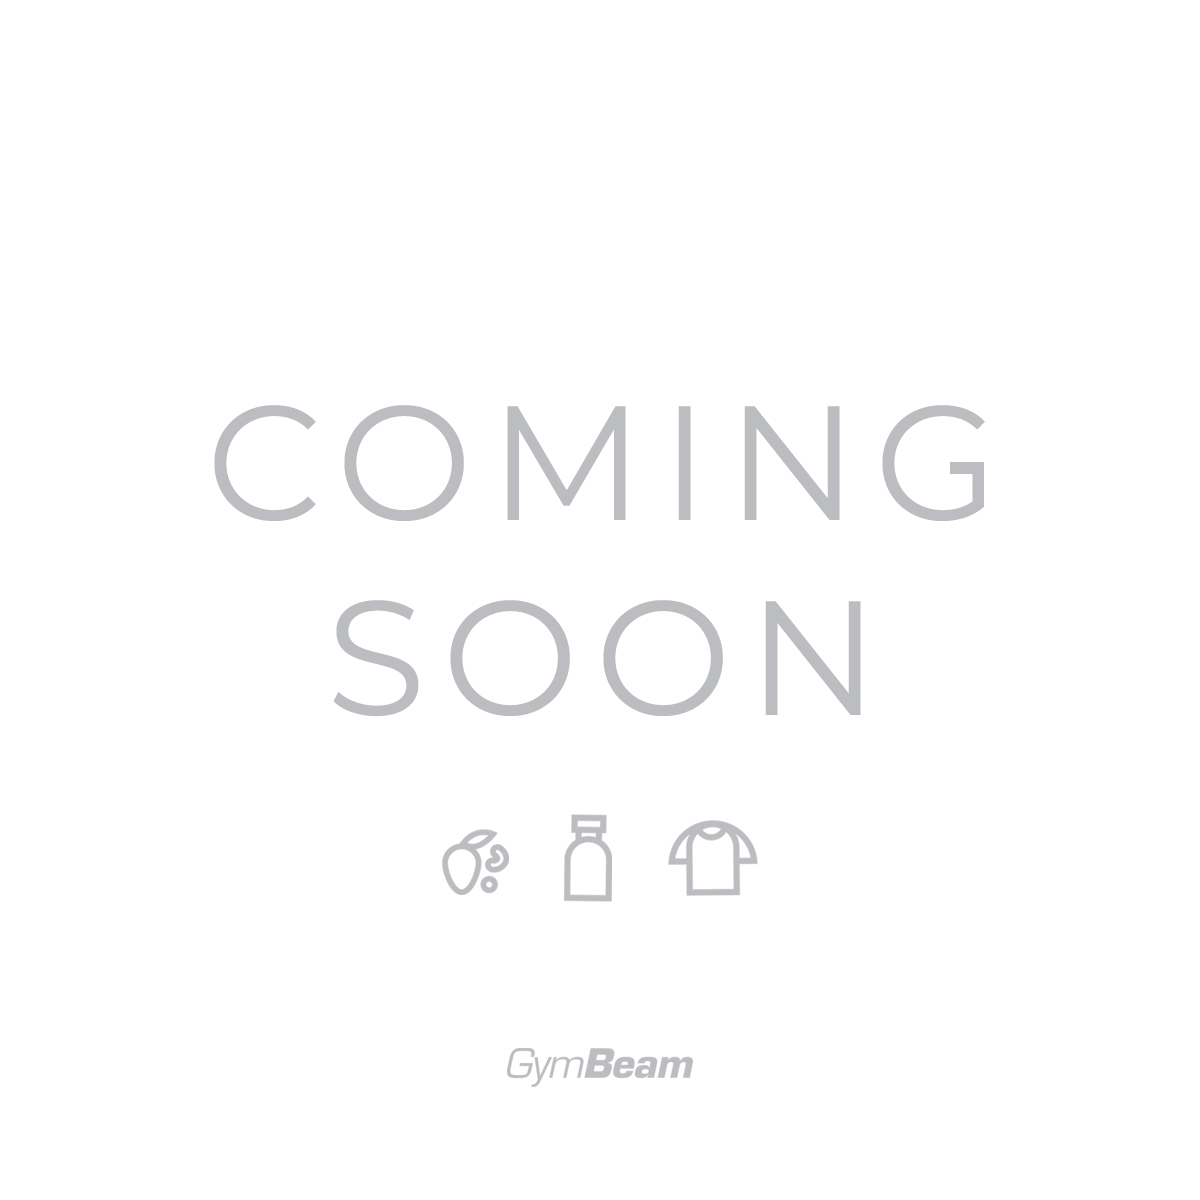 Predtréningový stimulant The Curse